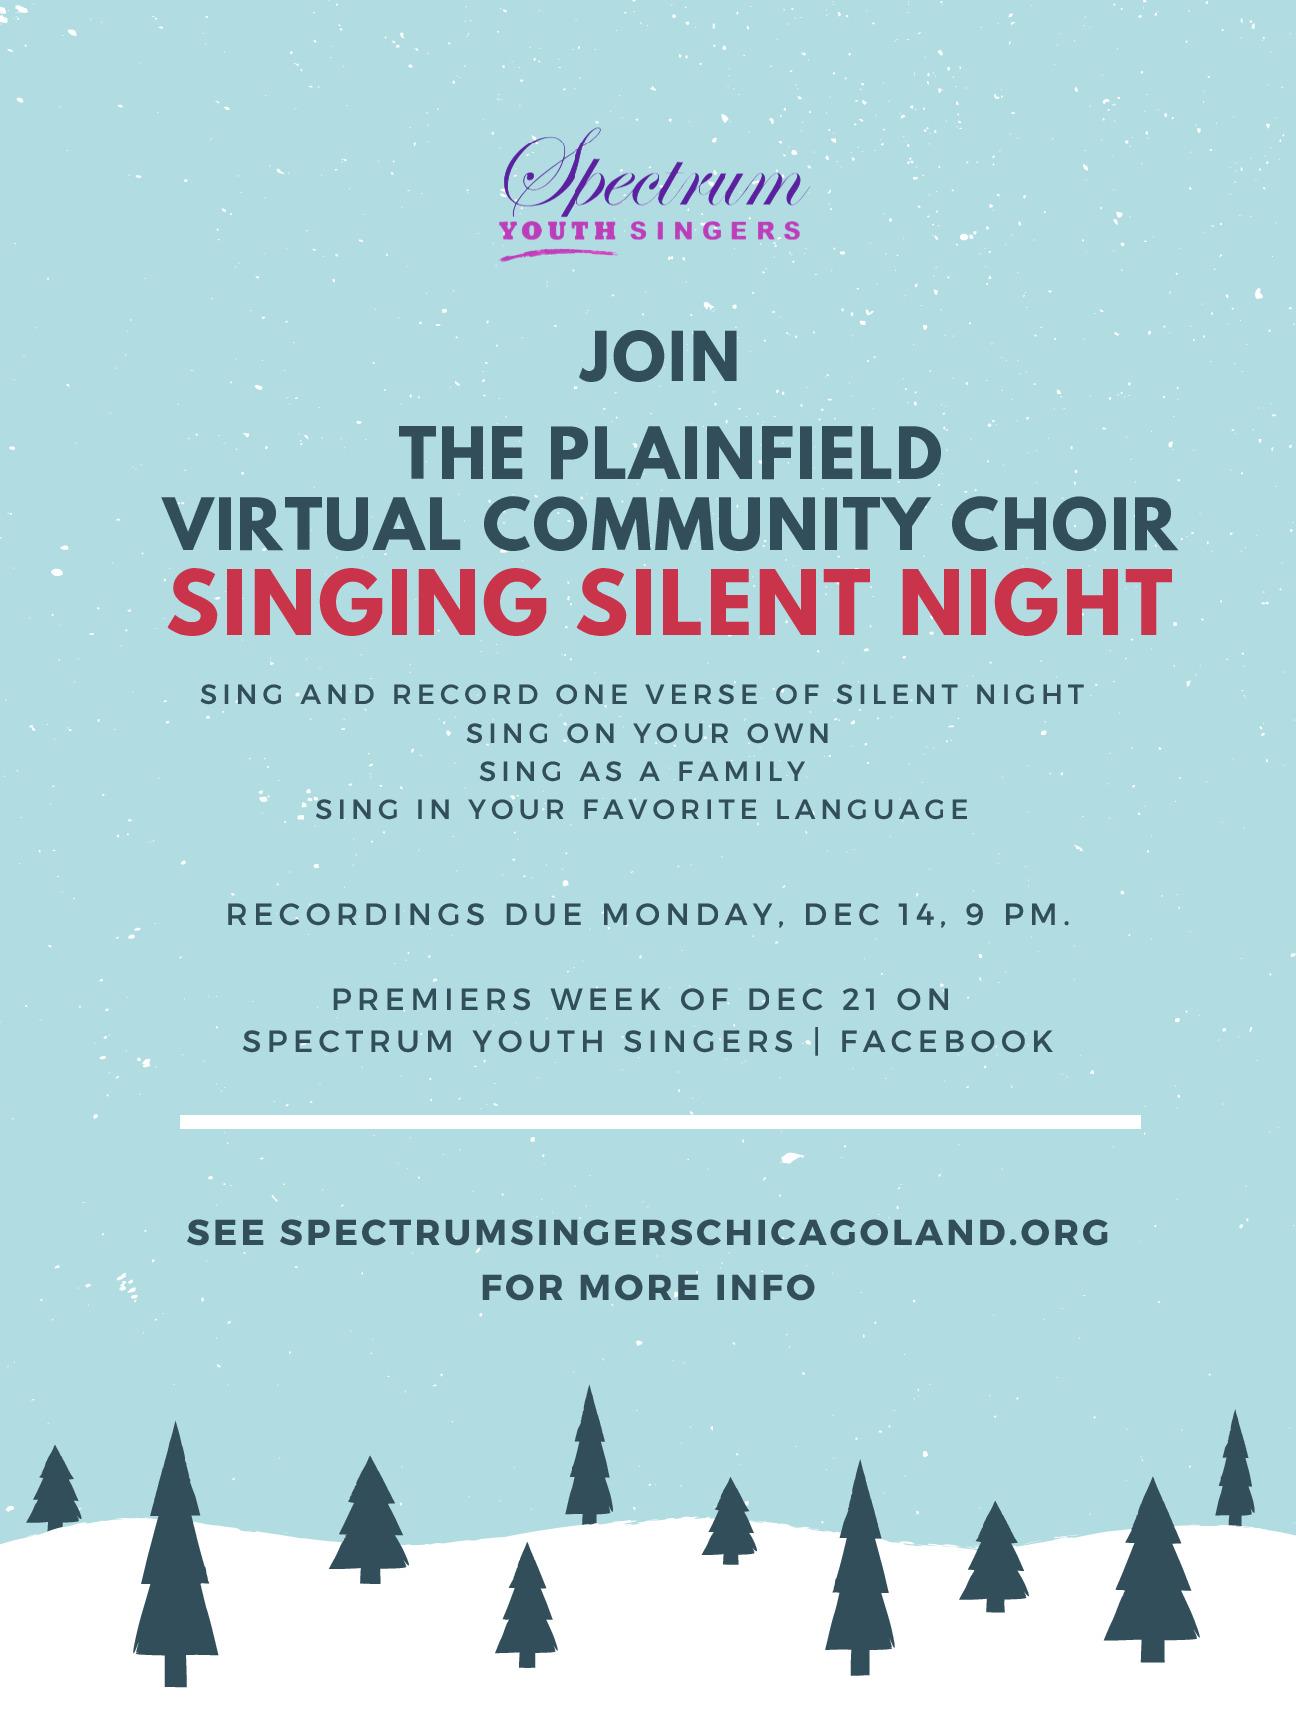 Spectrum Youth Singers Plainfield Virtual Community Choir